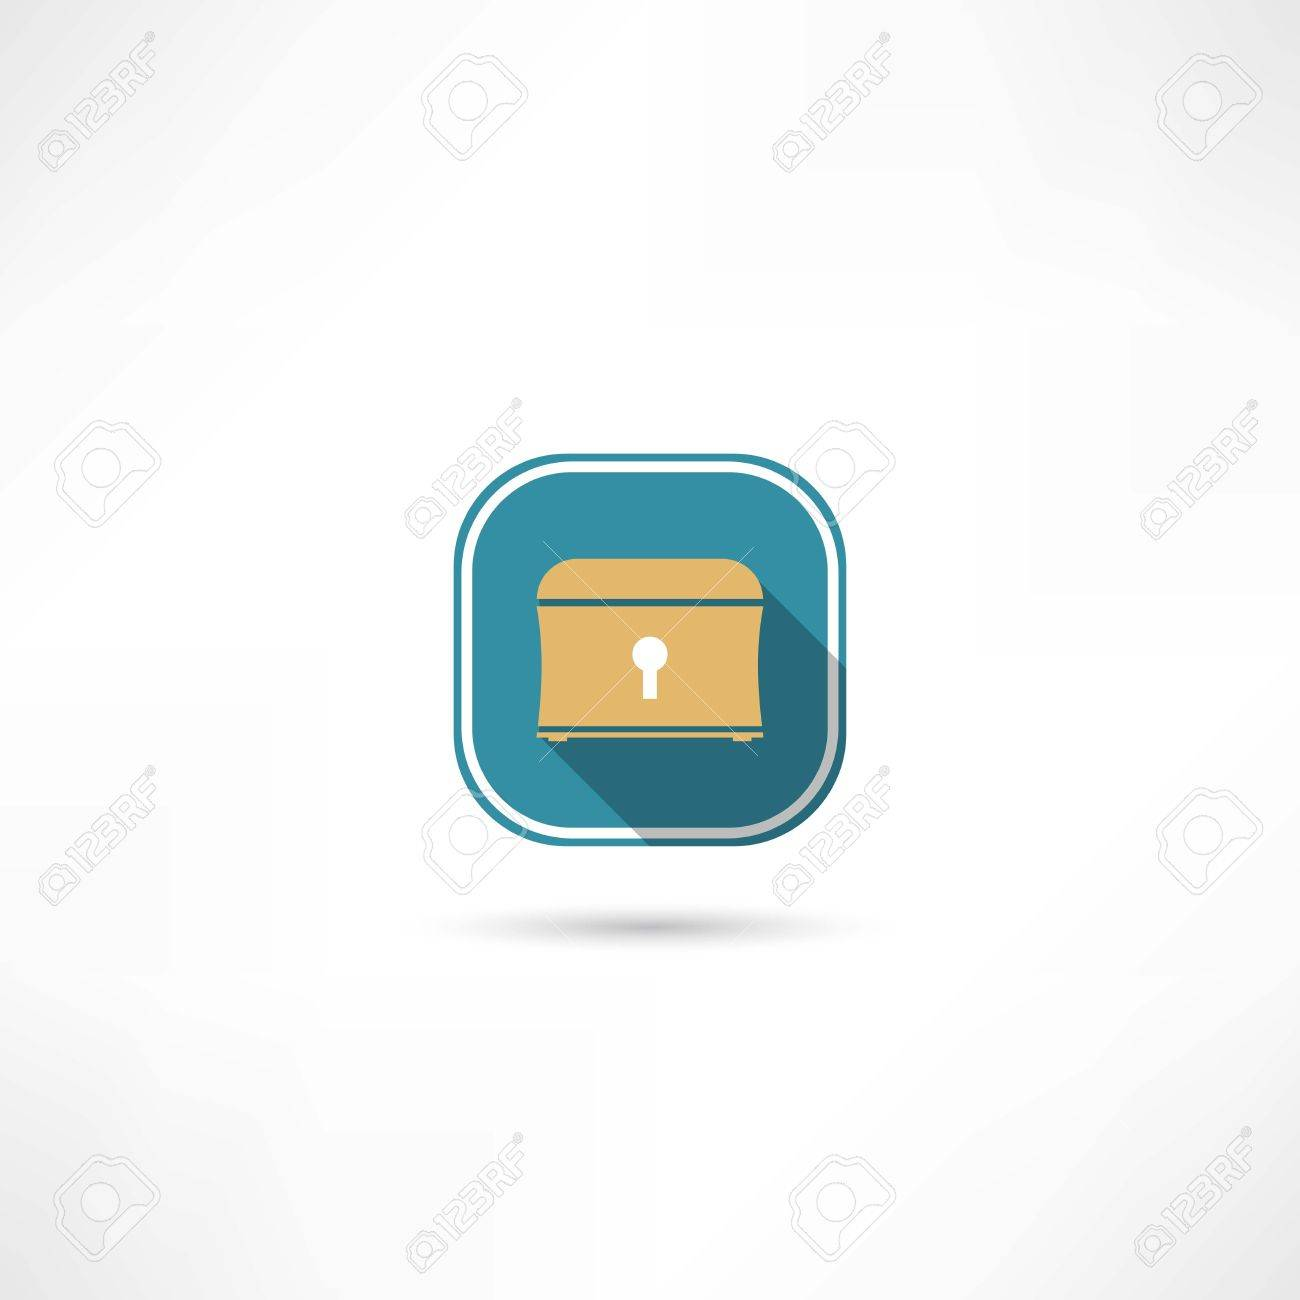 chest icon Stock Vector - 27531370